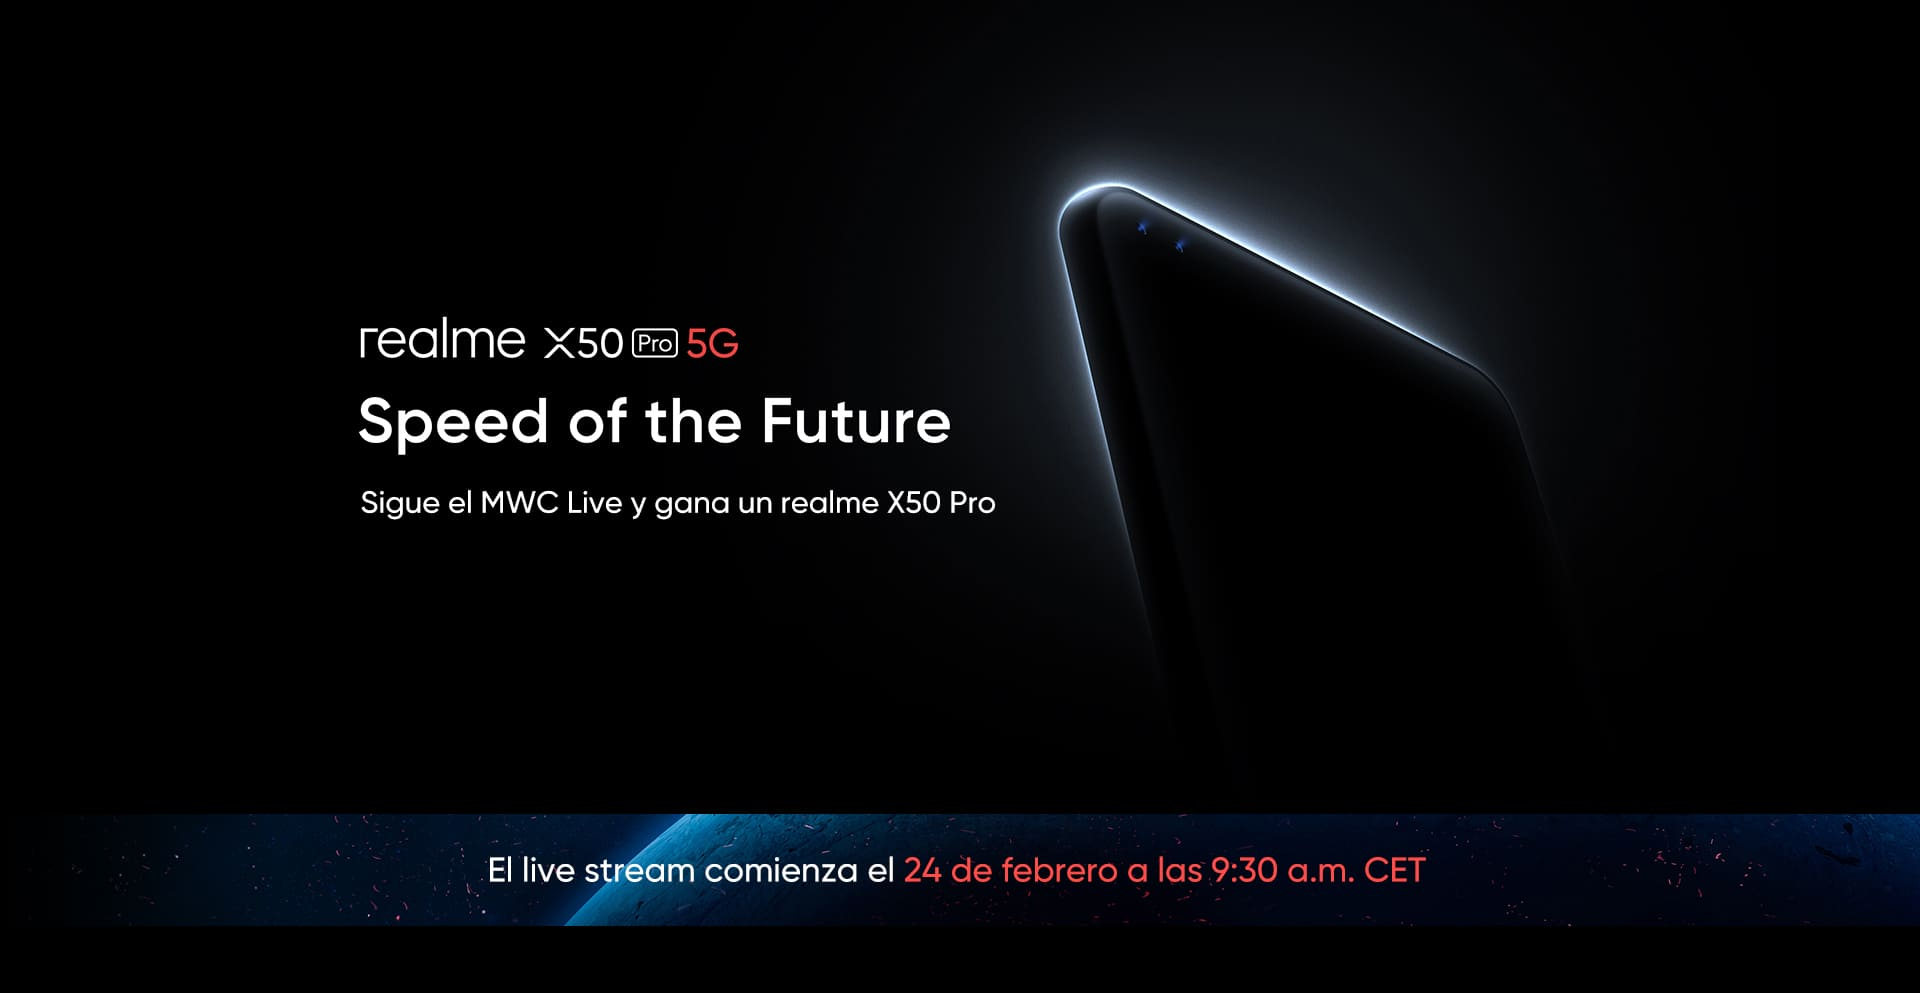 fecha-presentacion-Realme-X50-Pro-5G